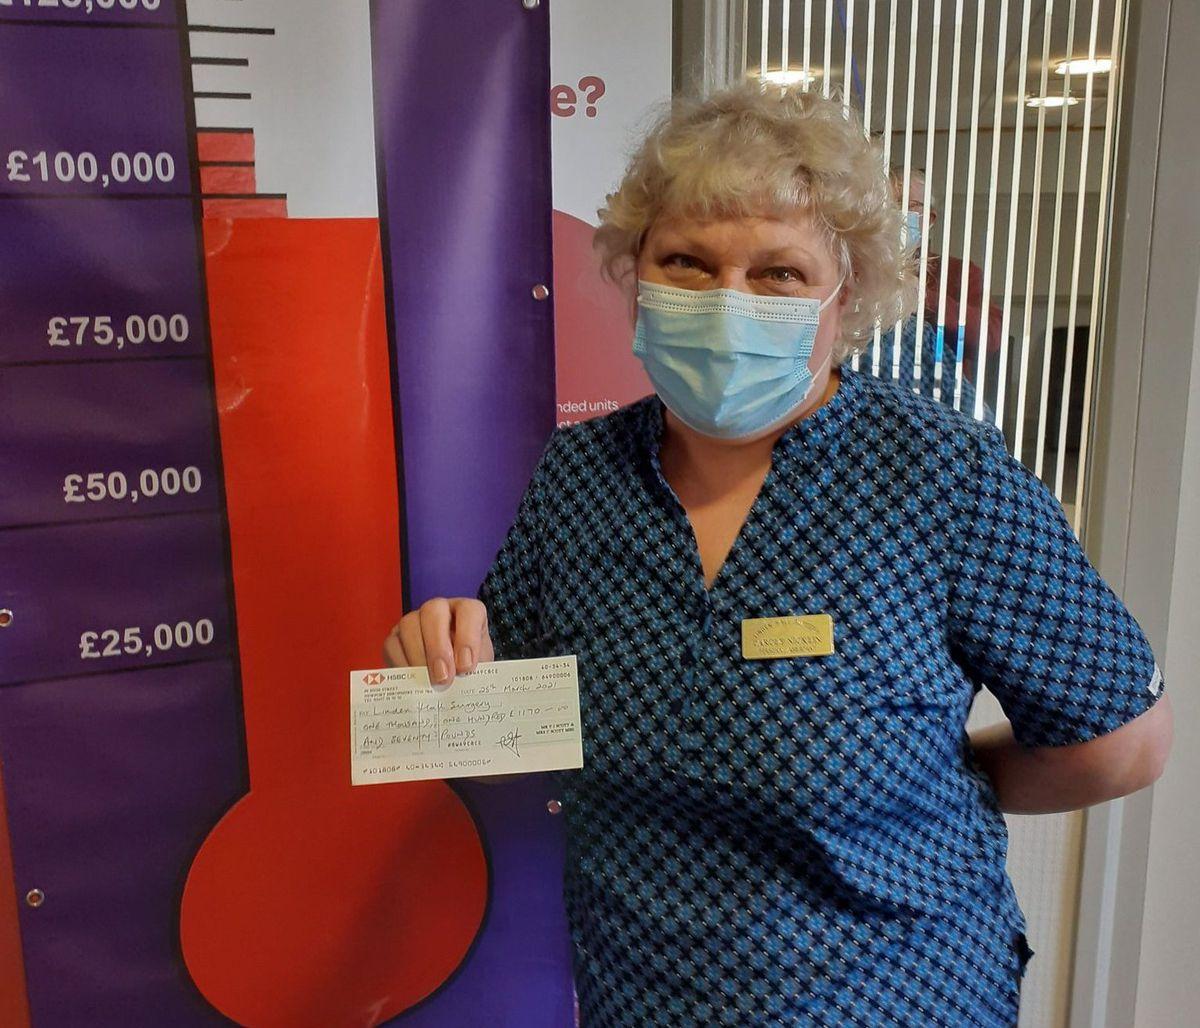 Carol Nicklin, deputy practice manager at Linden Hall Surgery